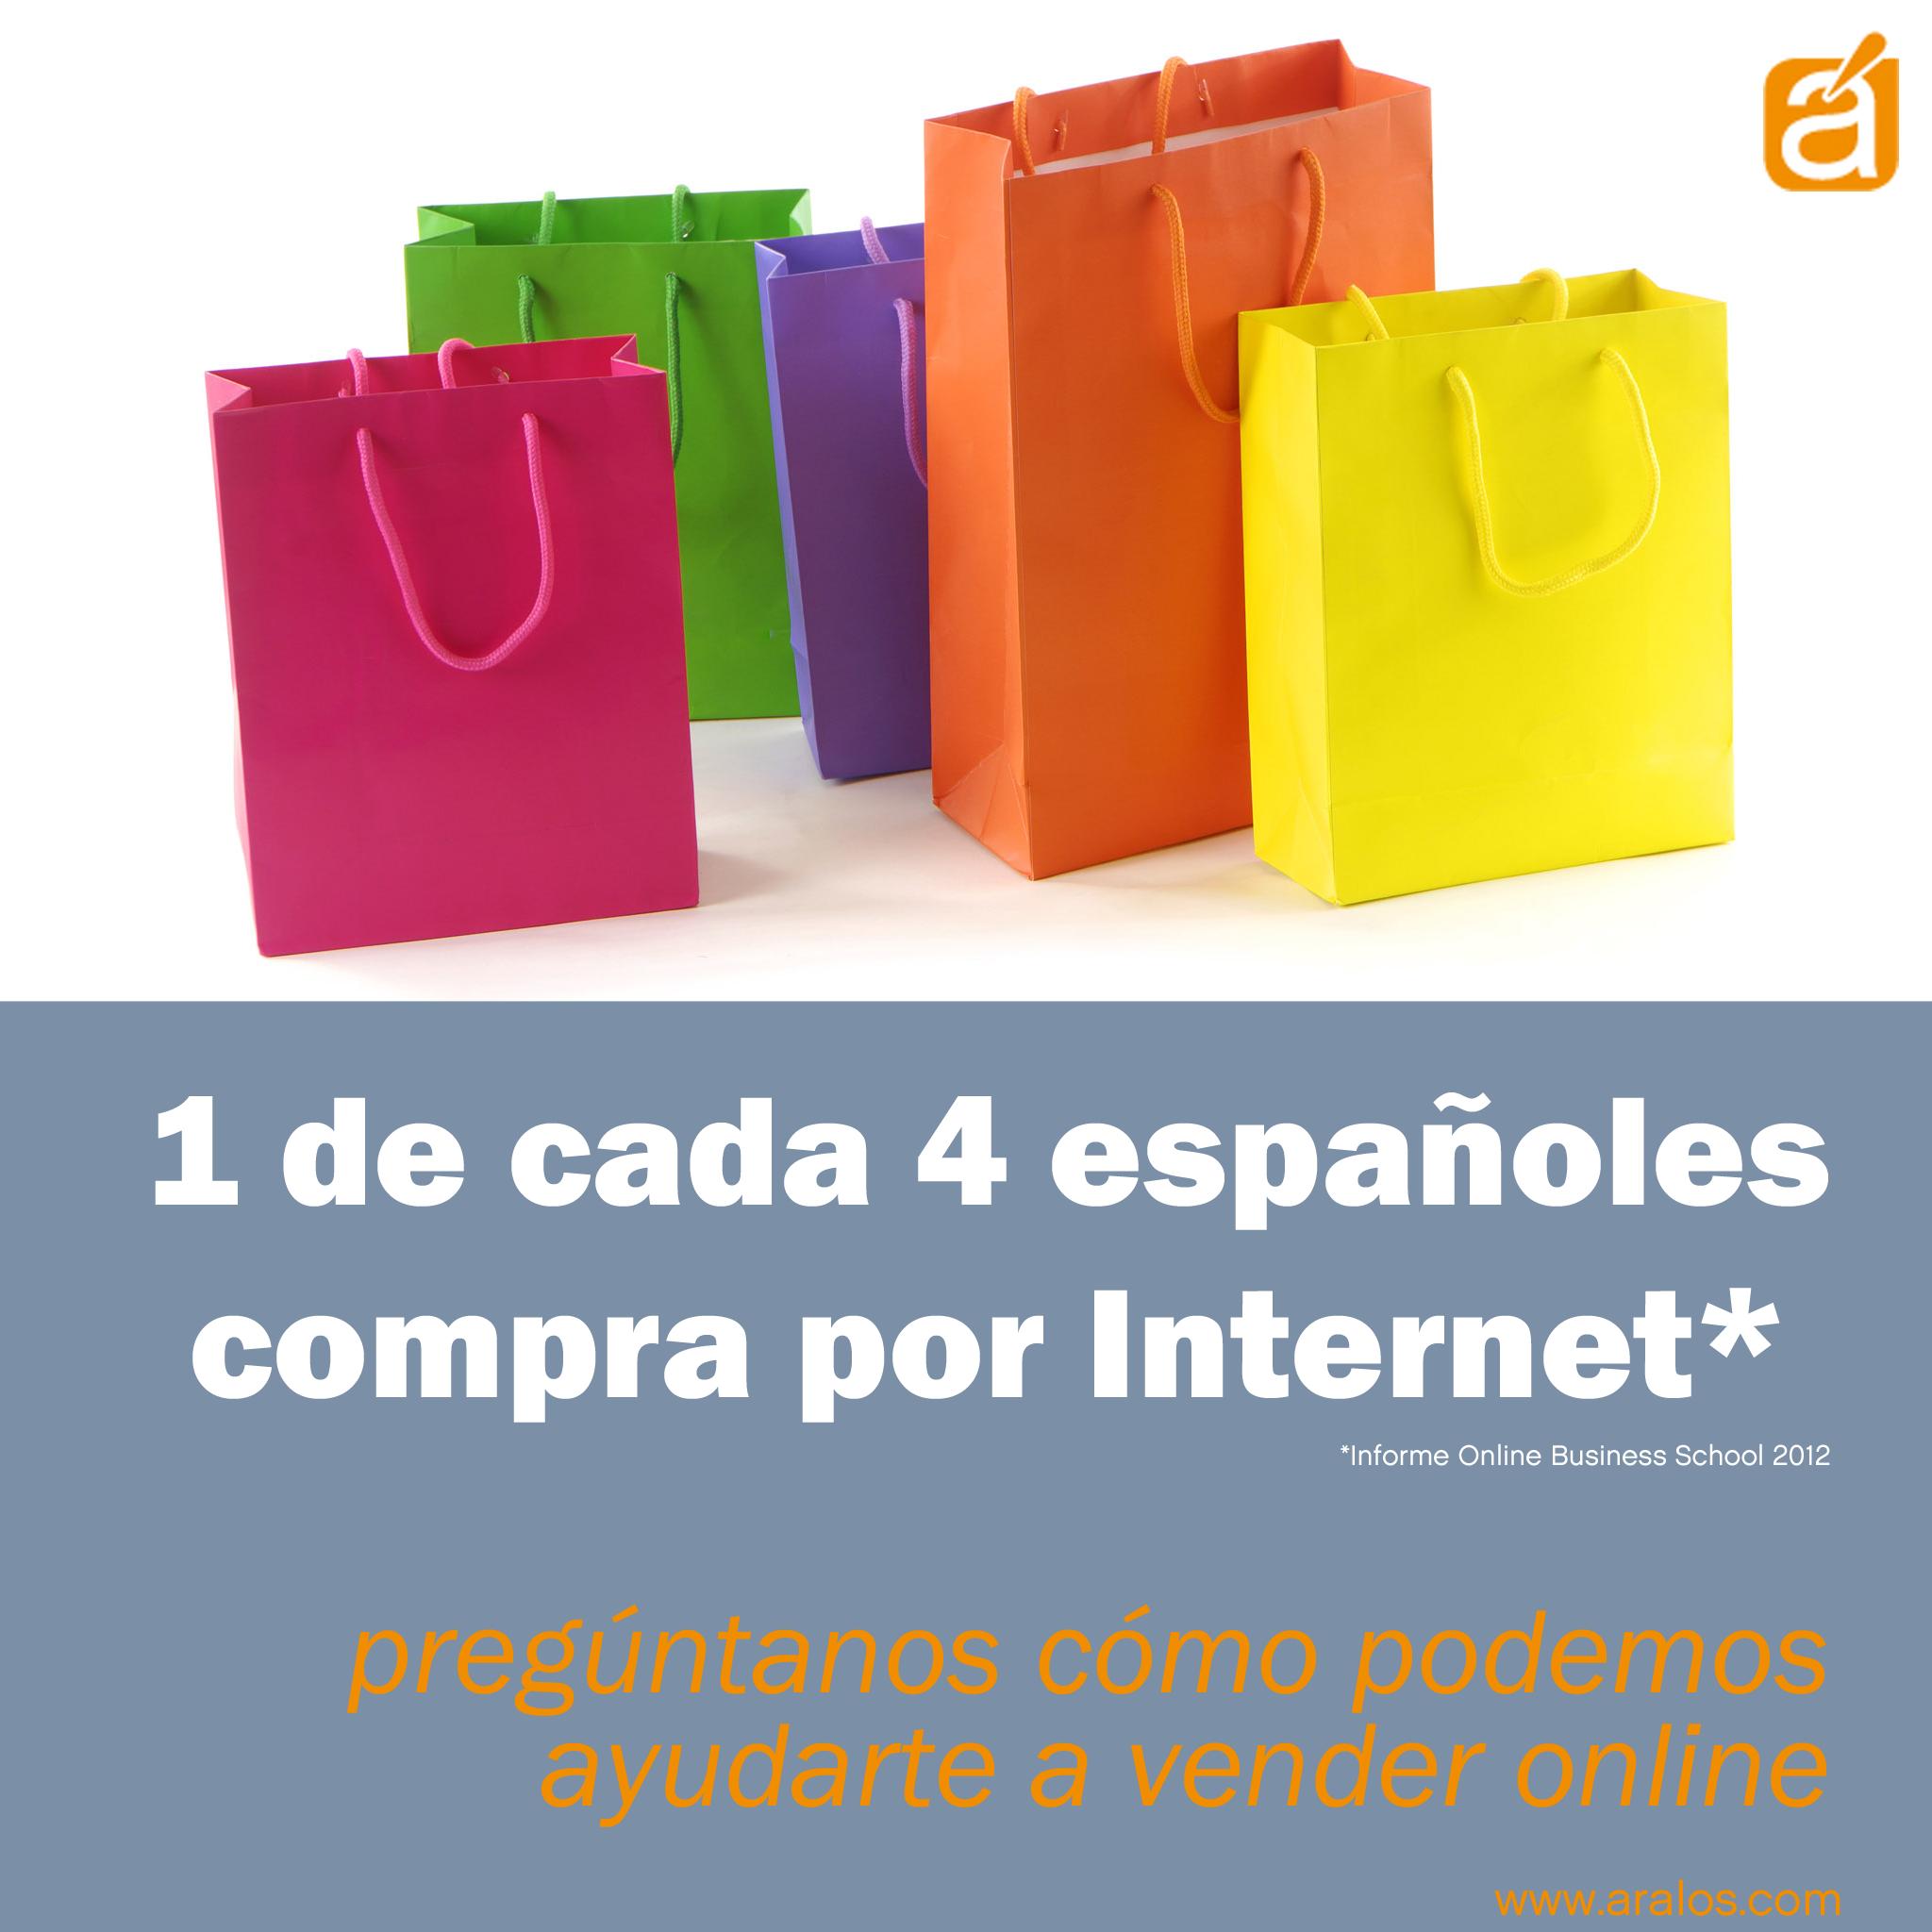 1 de cada 4 españoles compra por Internet